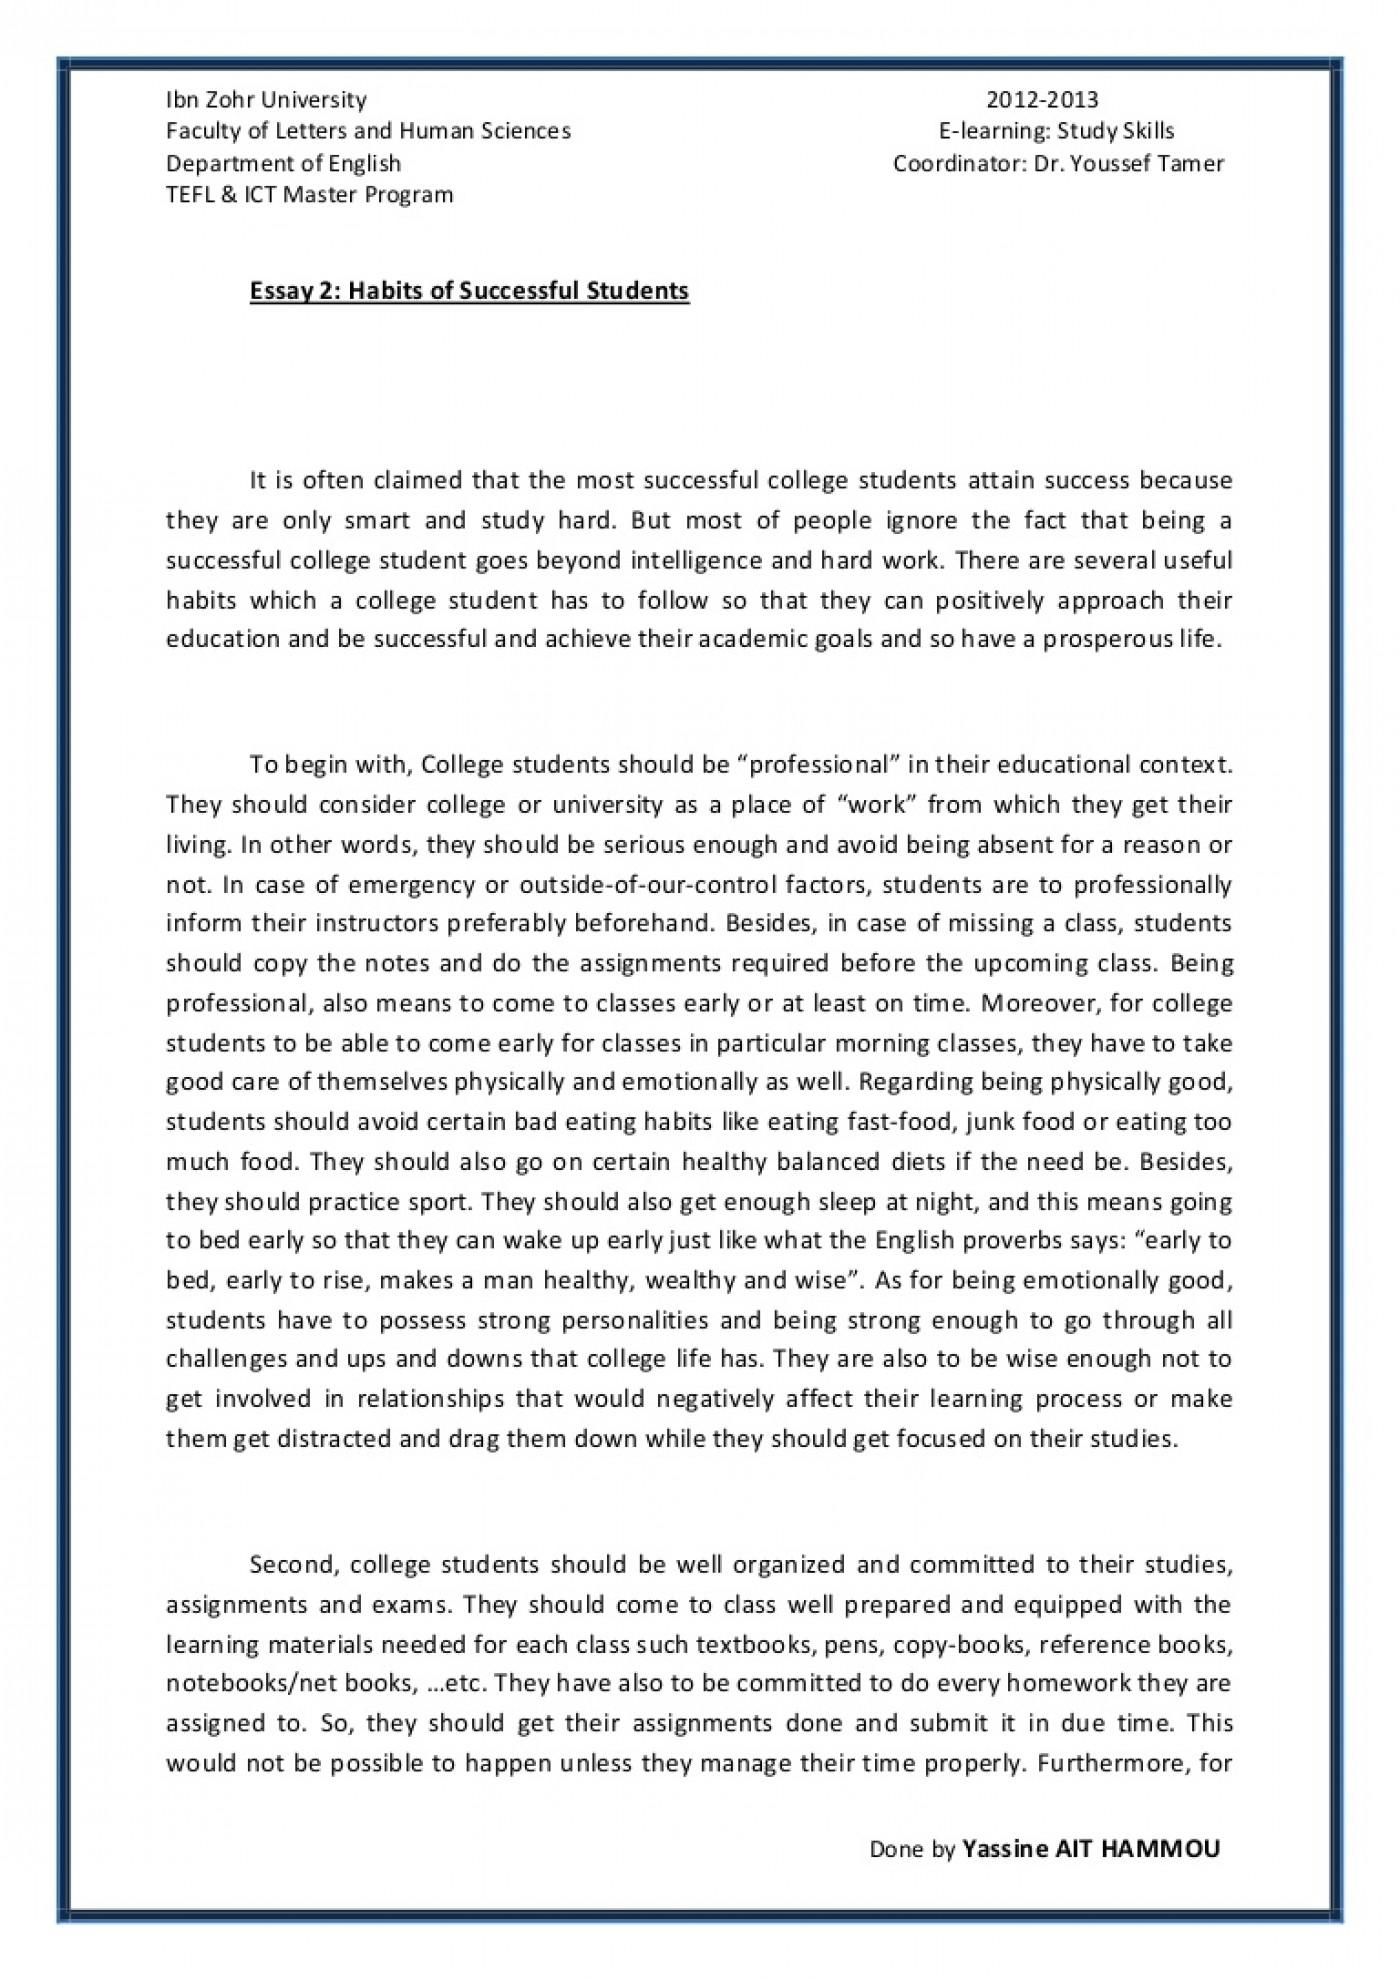 Civil service essay writing contest